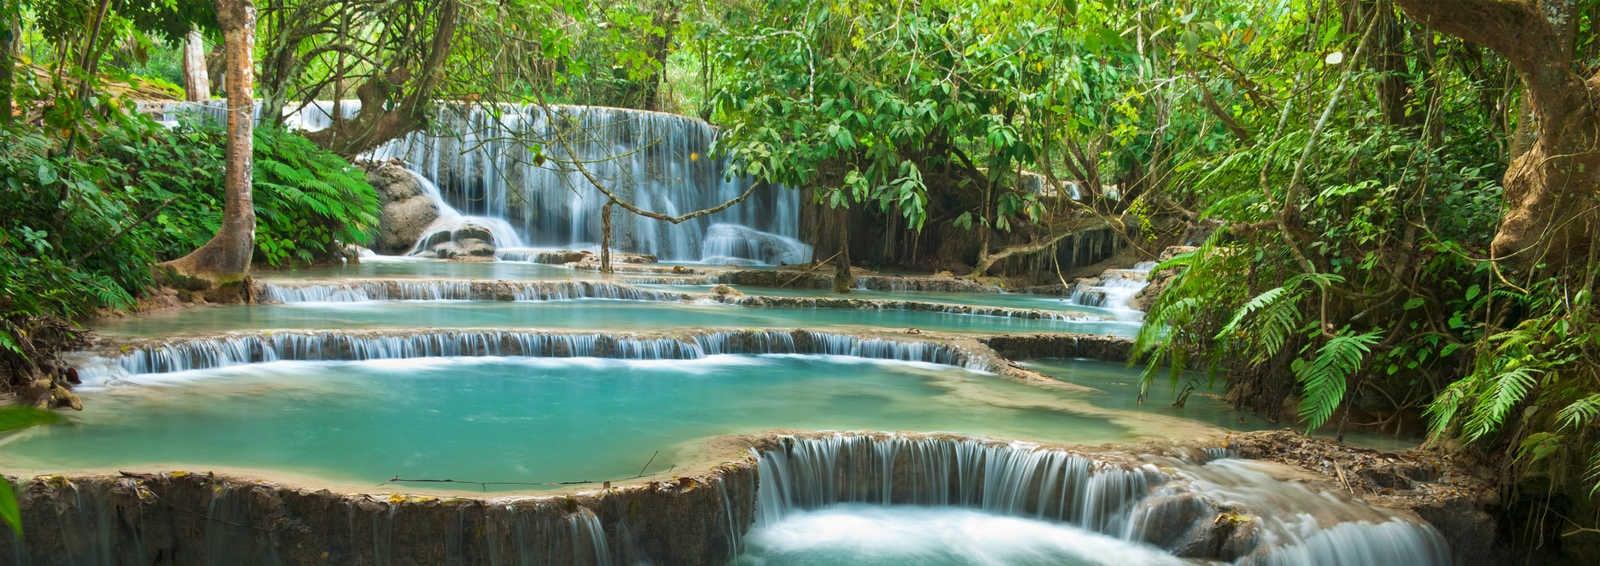 Kuang Si Waterfall, Luangprabang, Laos